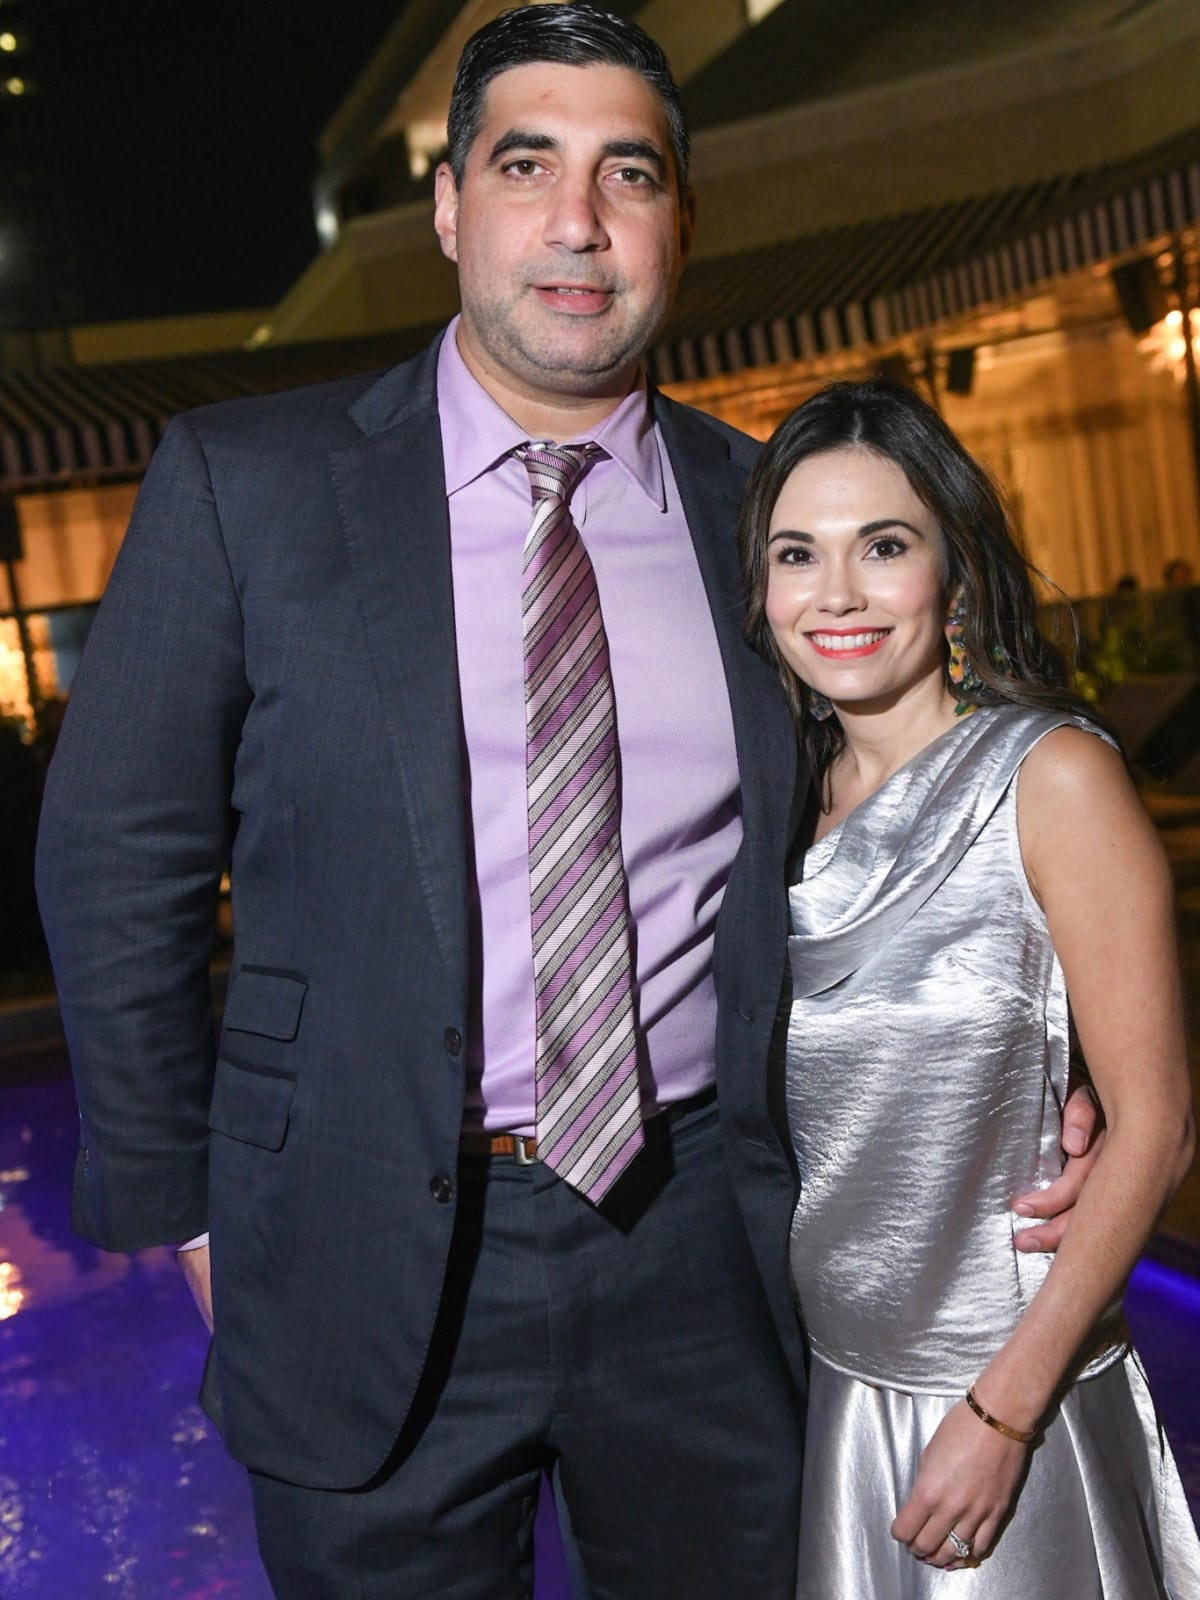 George Farah and Michele Leal Farah